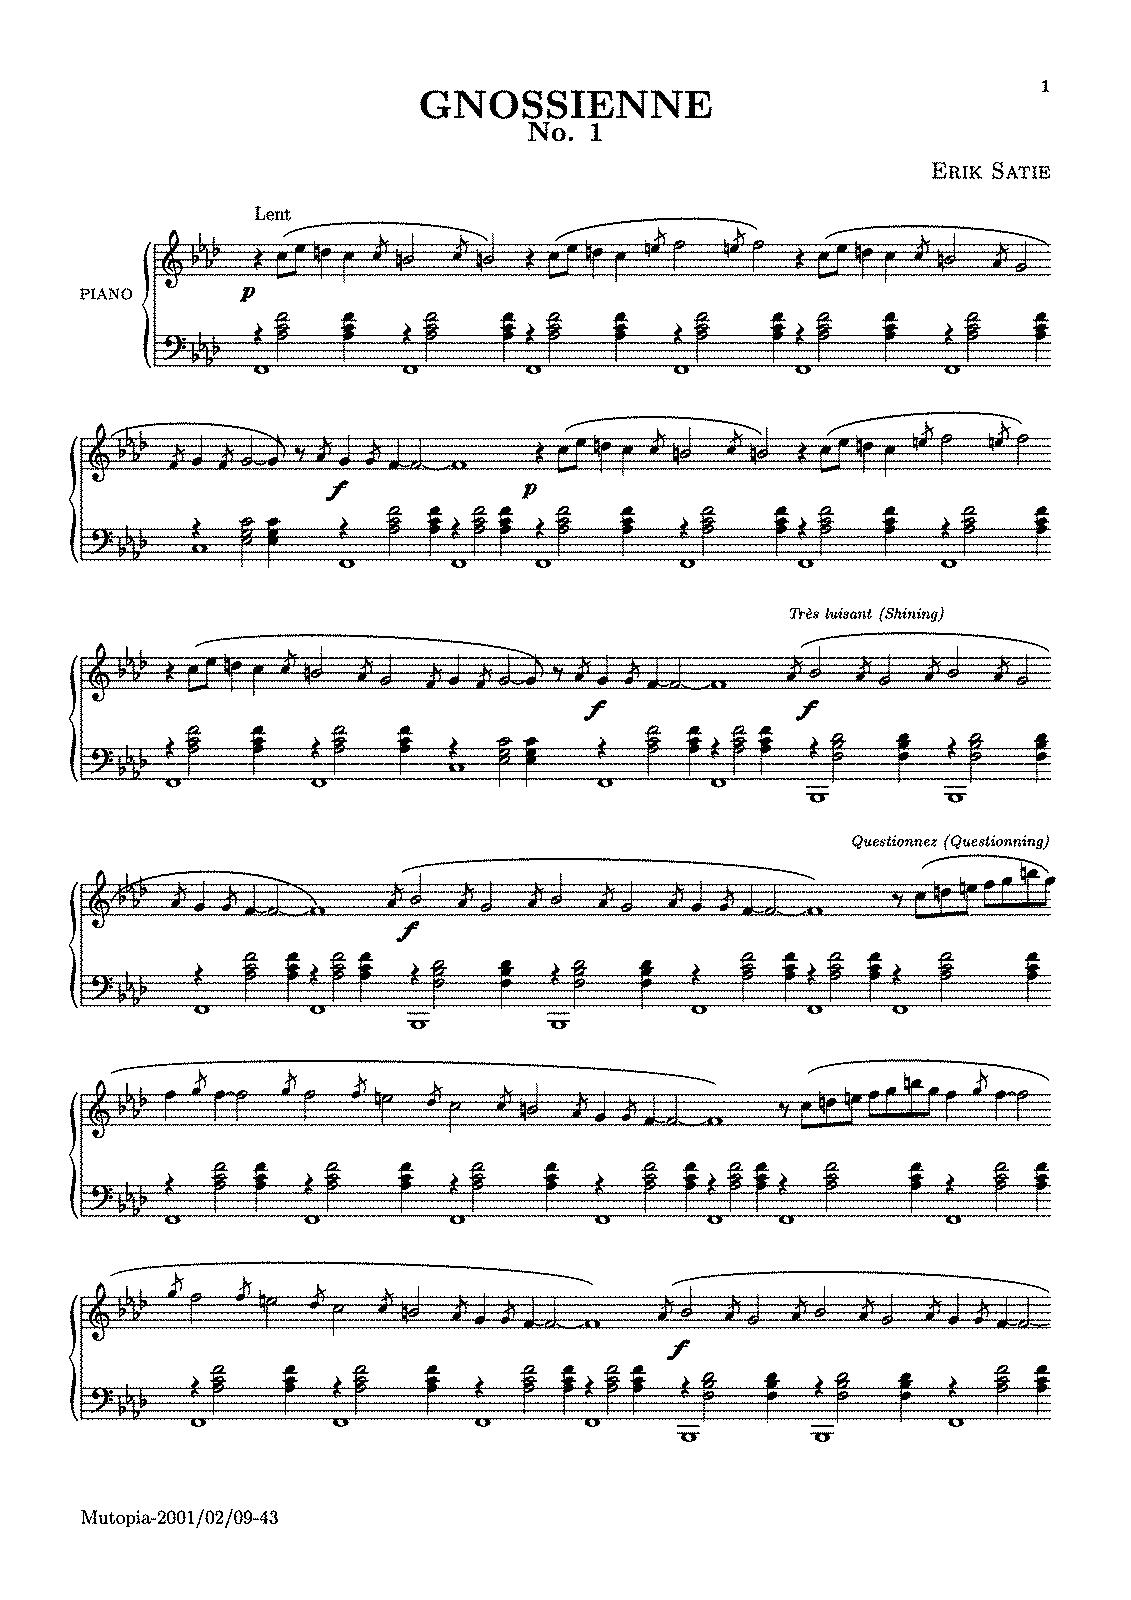 GNOSSIENNE 3 GUITAR PDF DOWNLOAD